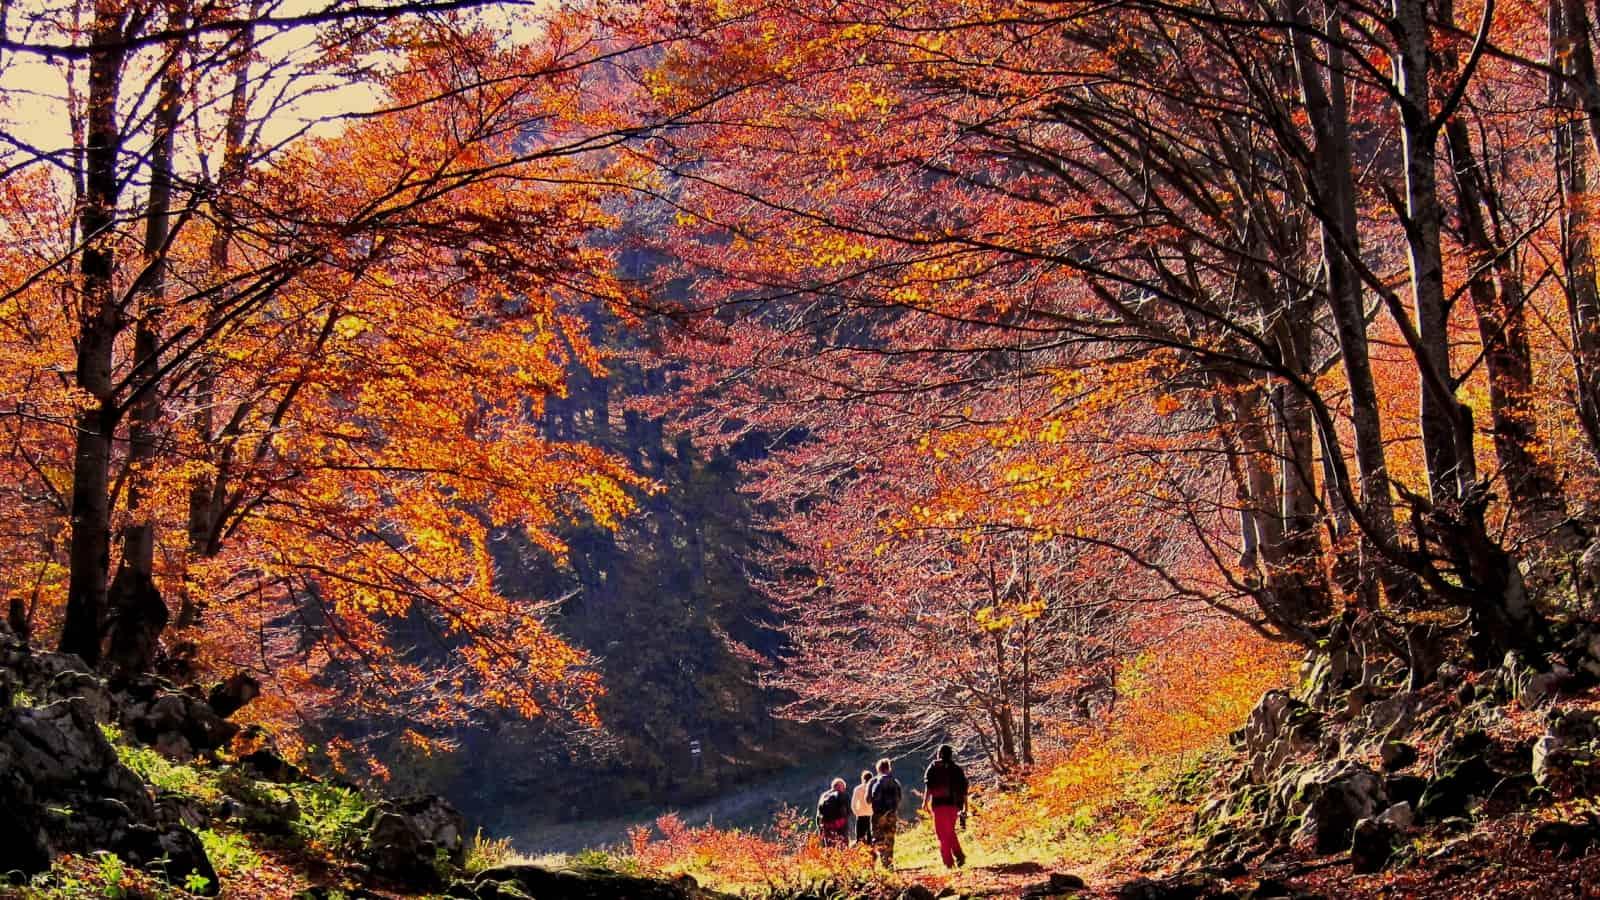 Buchenwald am Beginn der Tour - Foto: Naturpark Vachranski Balkan/Krasimir Lakovski